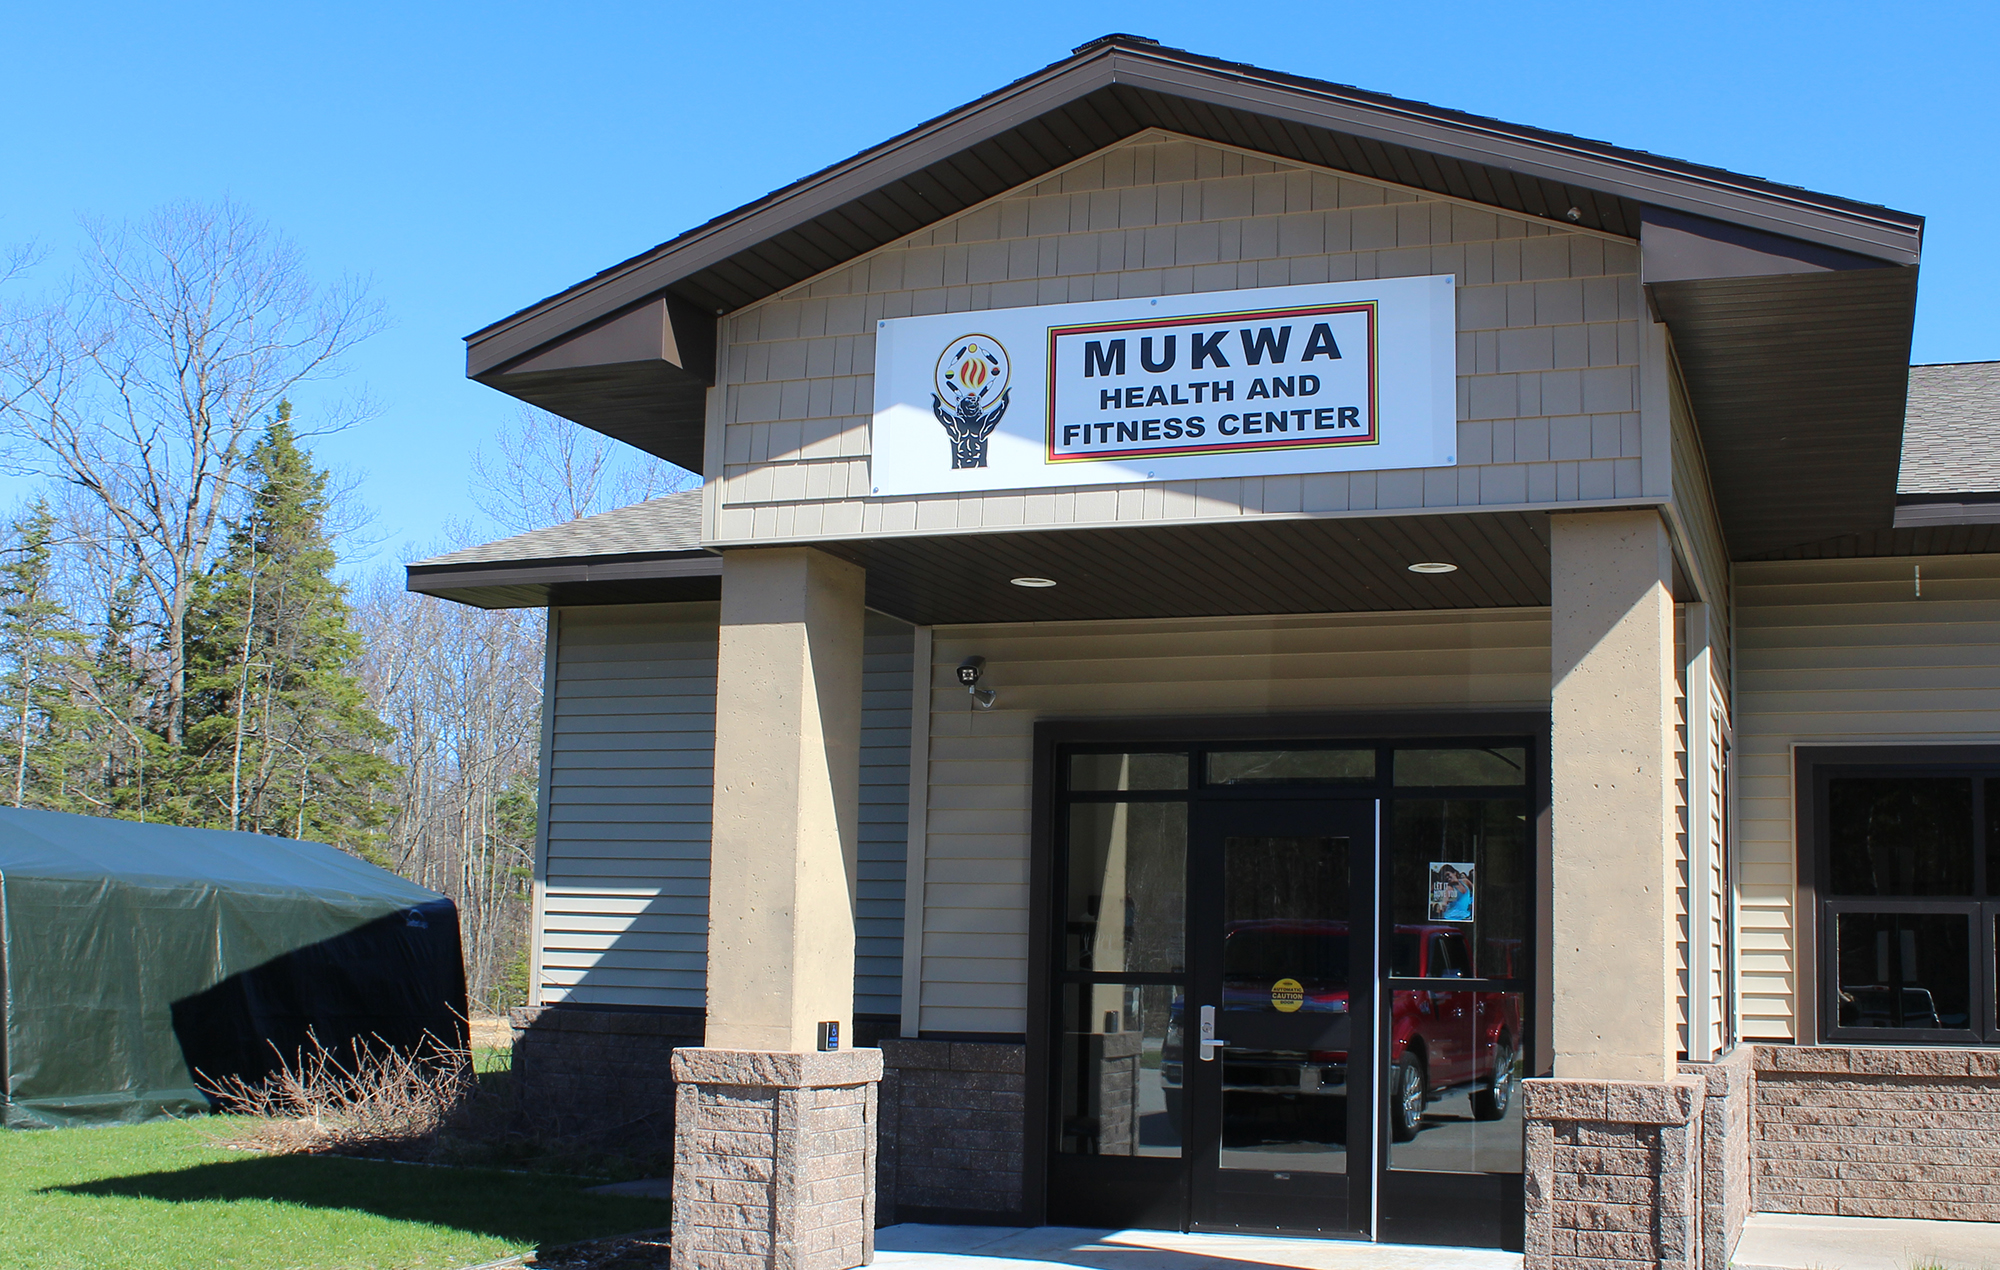 Mukwa Fitness Center Building